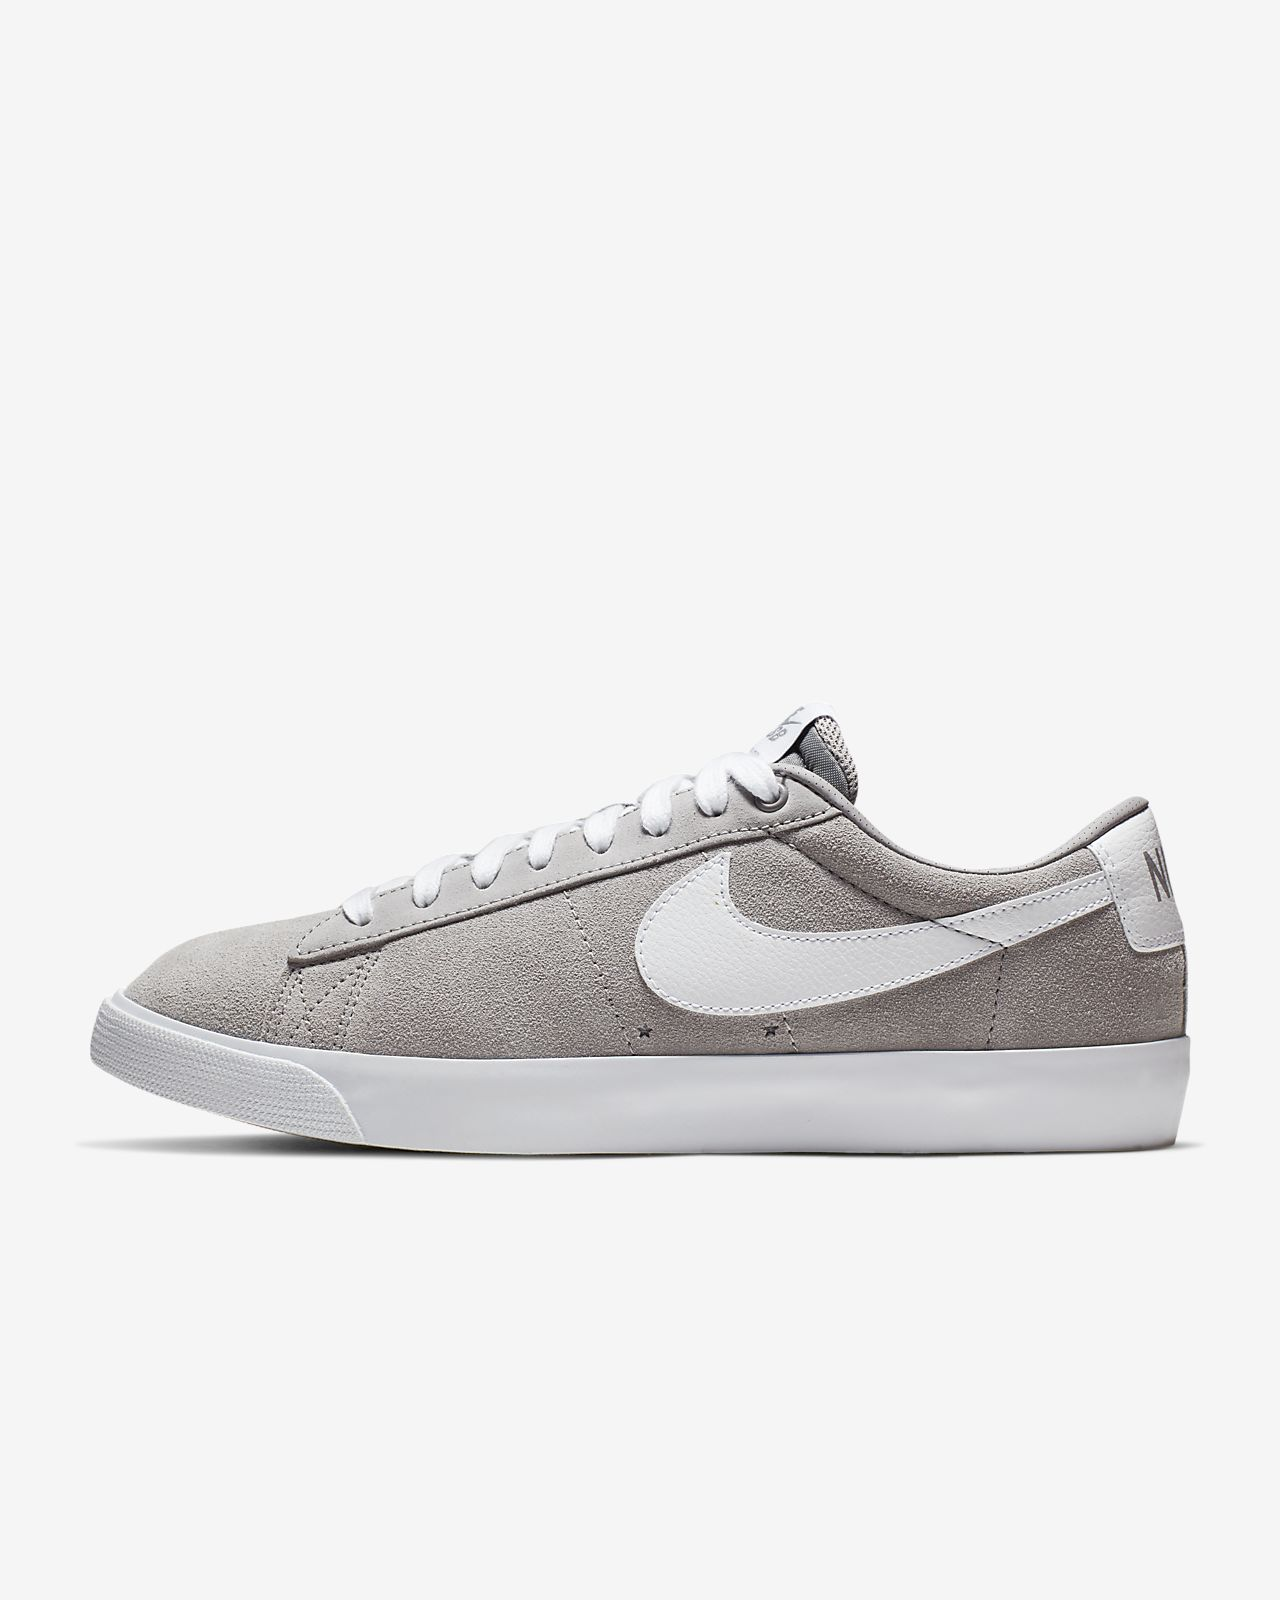 Blazer Skate Shoe SB GT Low Nike rCBeoxd